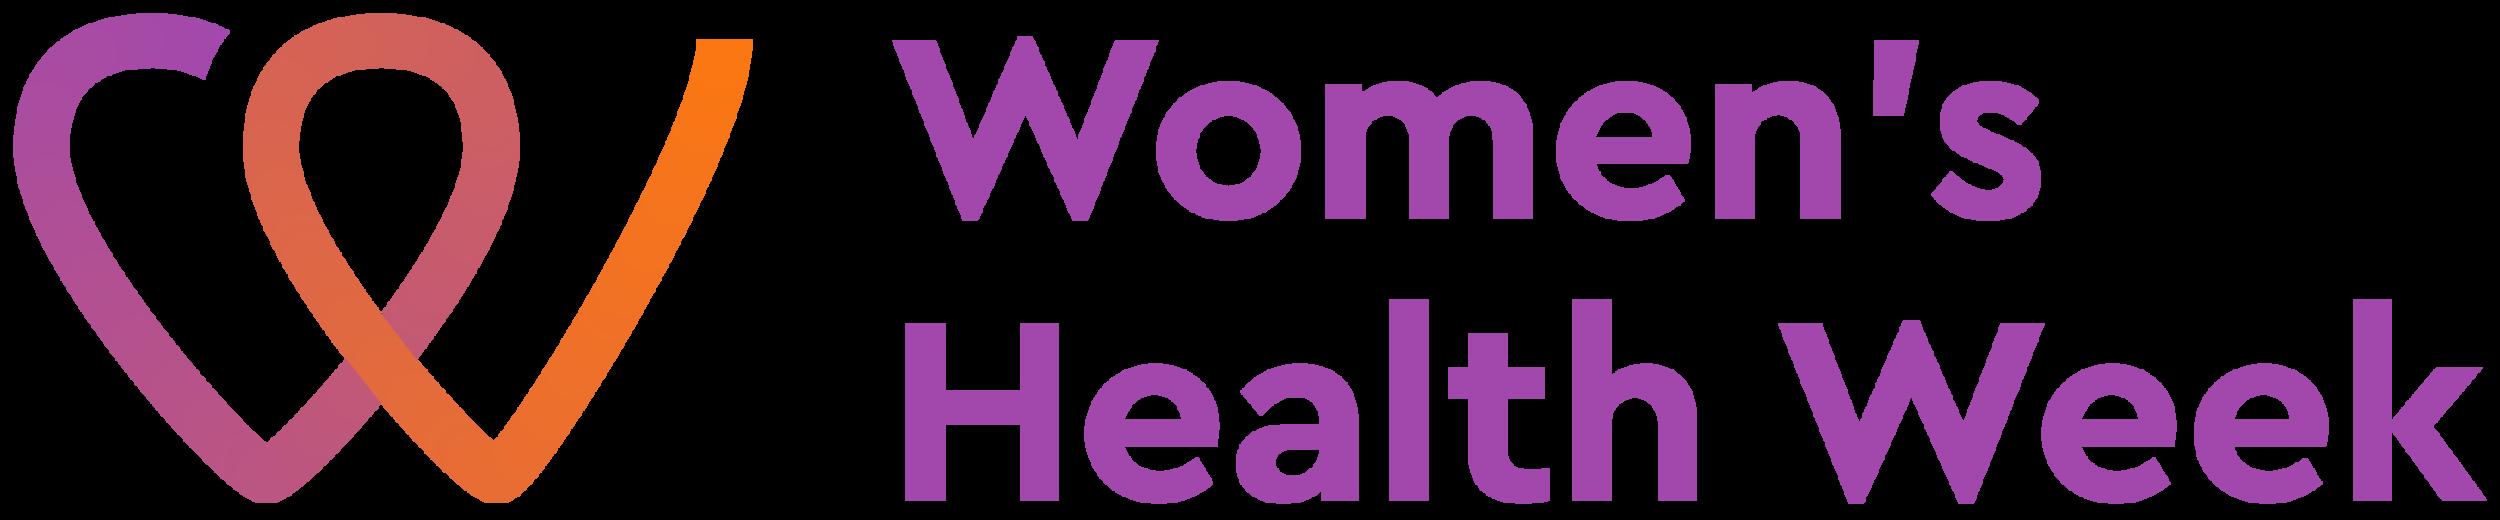 WomensHealthWeek_COLOUR_RGB_PrimaryWordmark.png